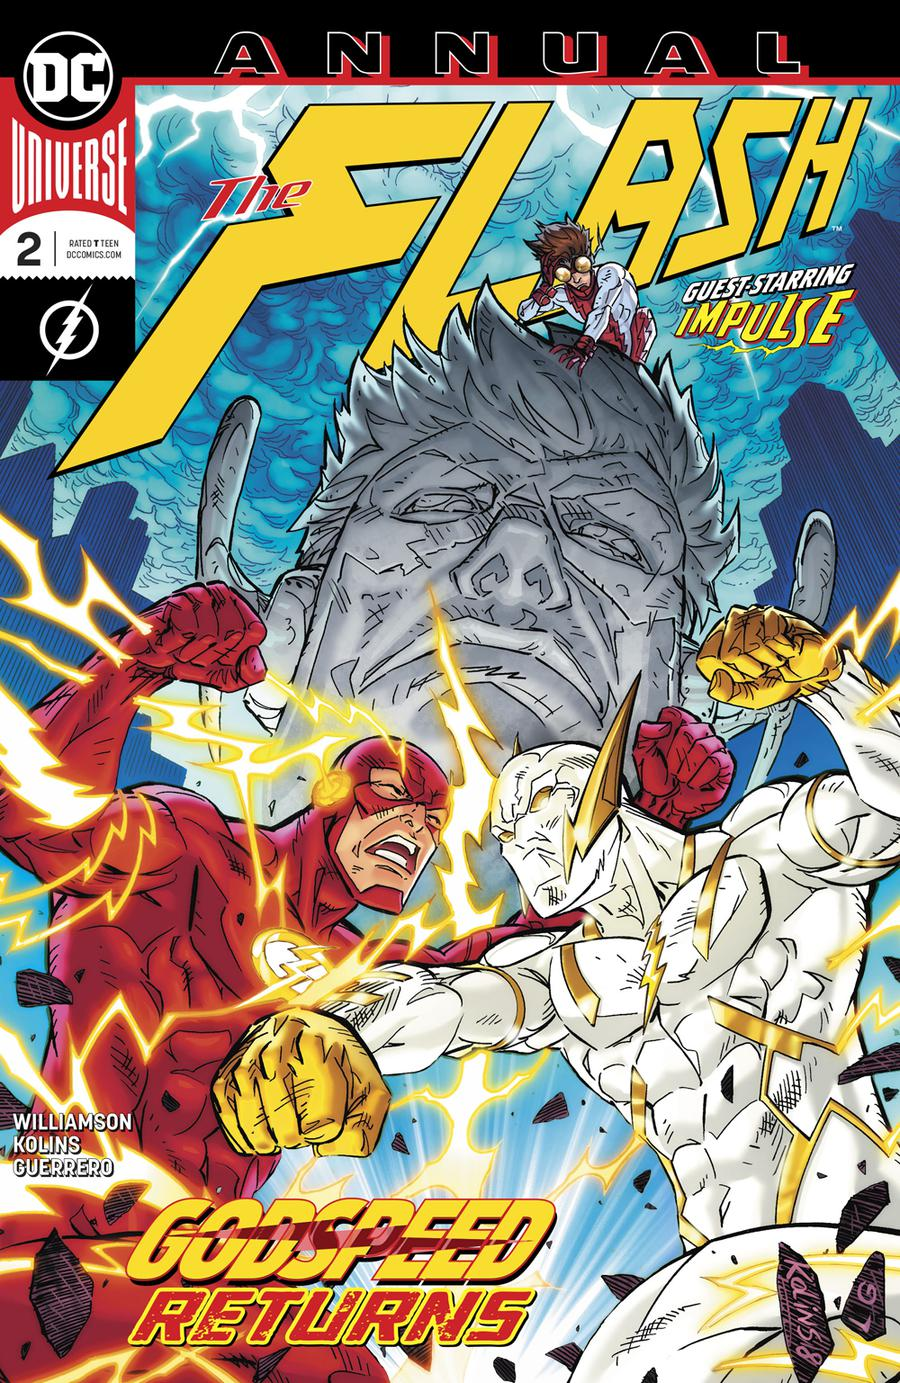 Flash Vol 5 Annual #2 (Heroes In Crisis Tie-In)